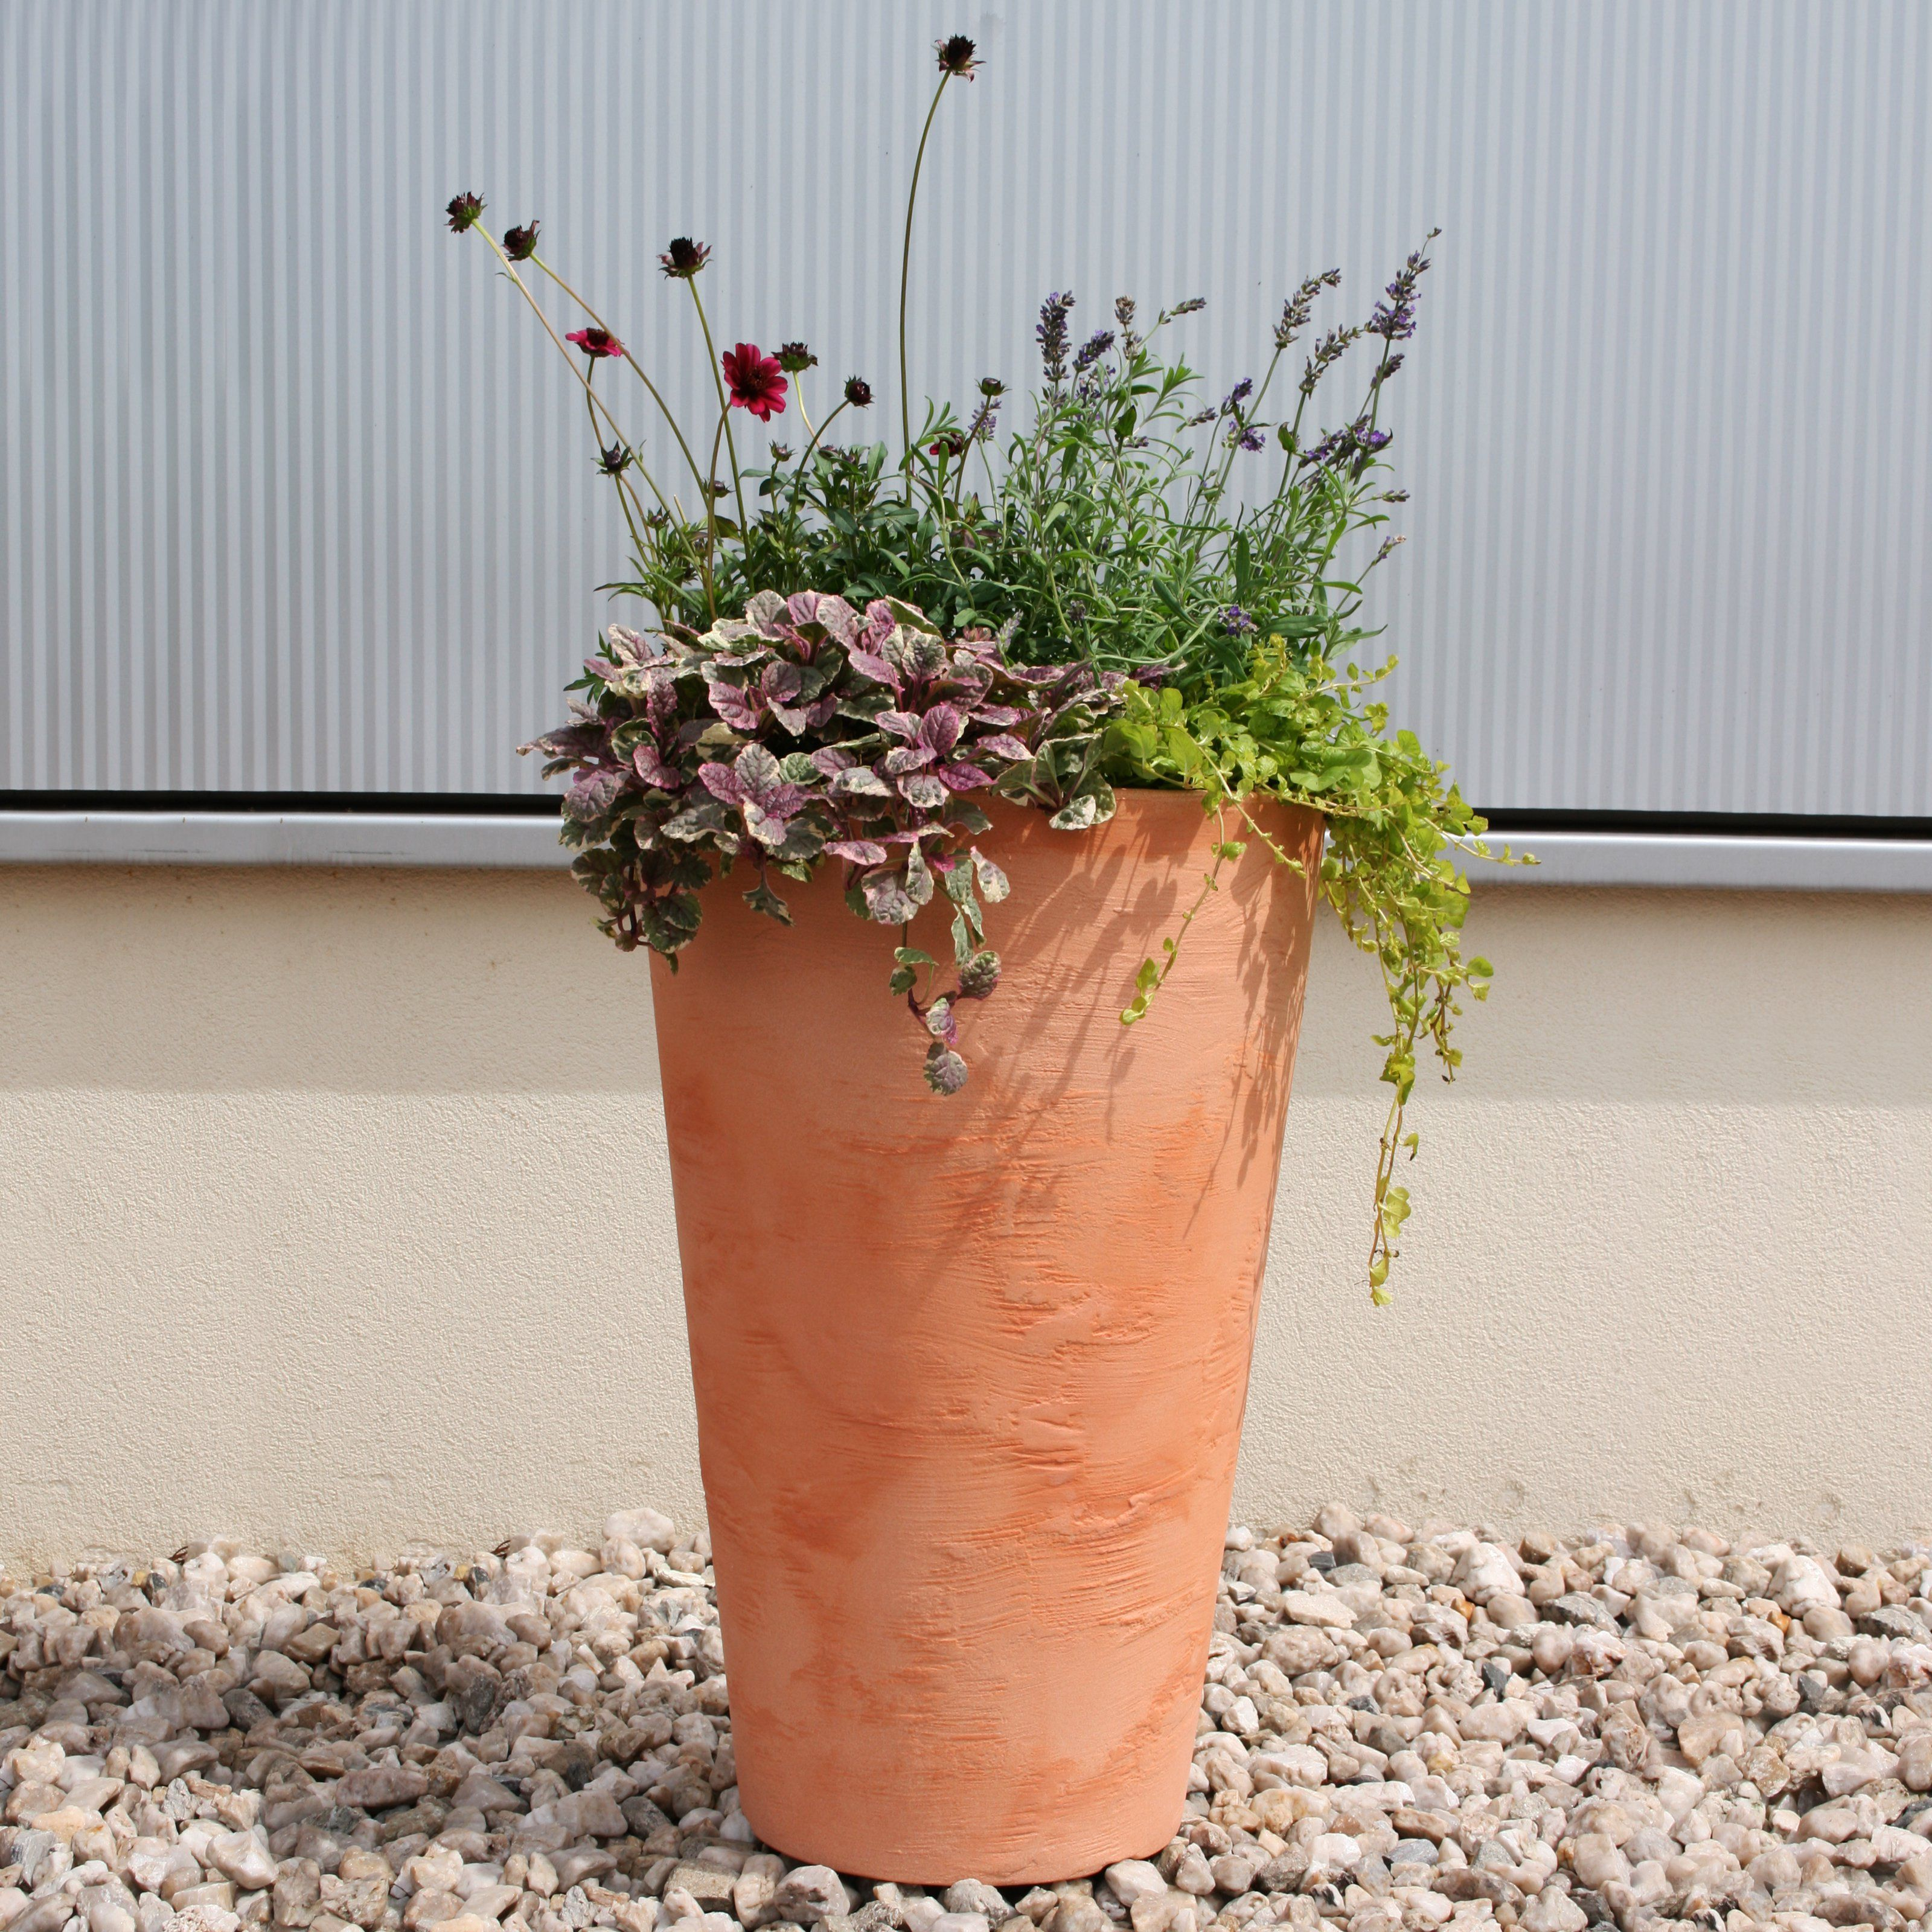 Carina Round Resin Planter From Hayneedle Com Resin Planters